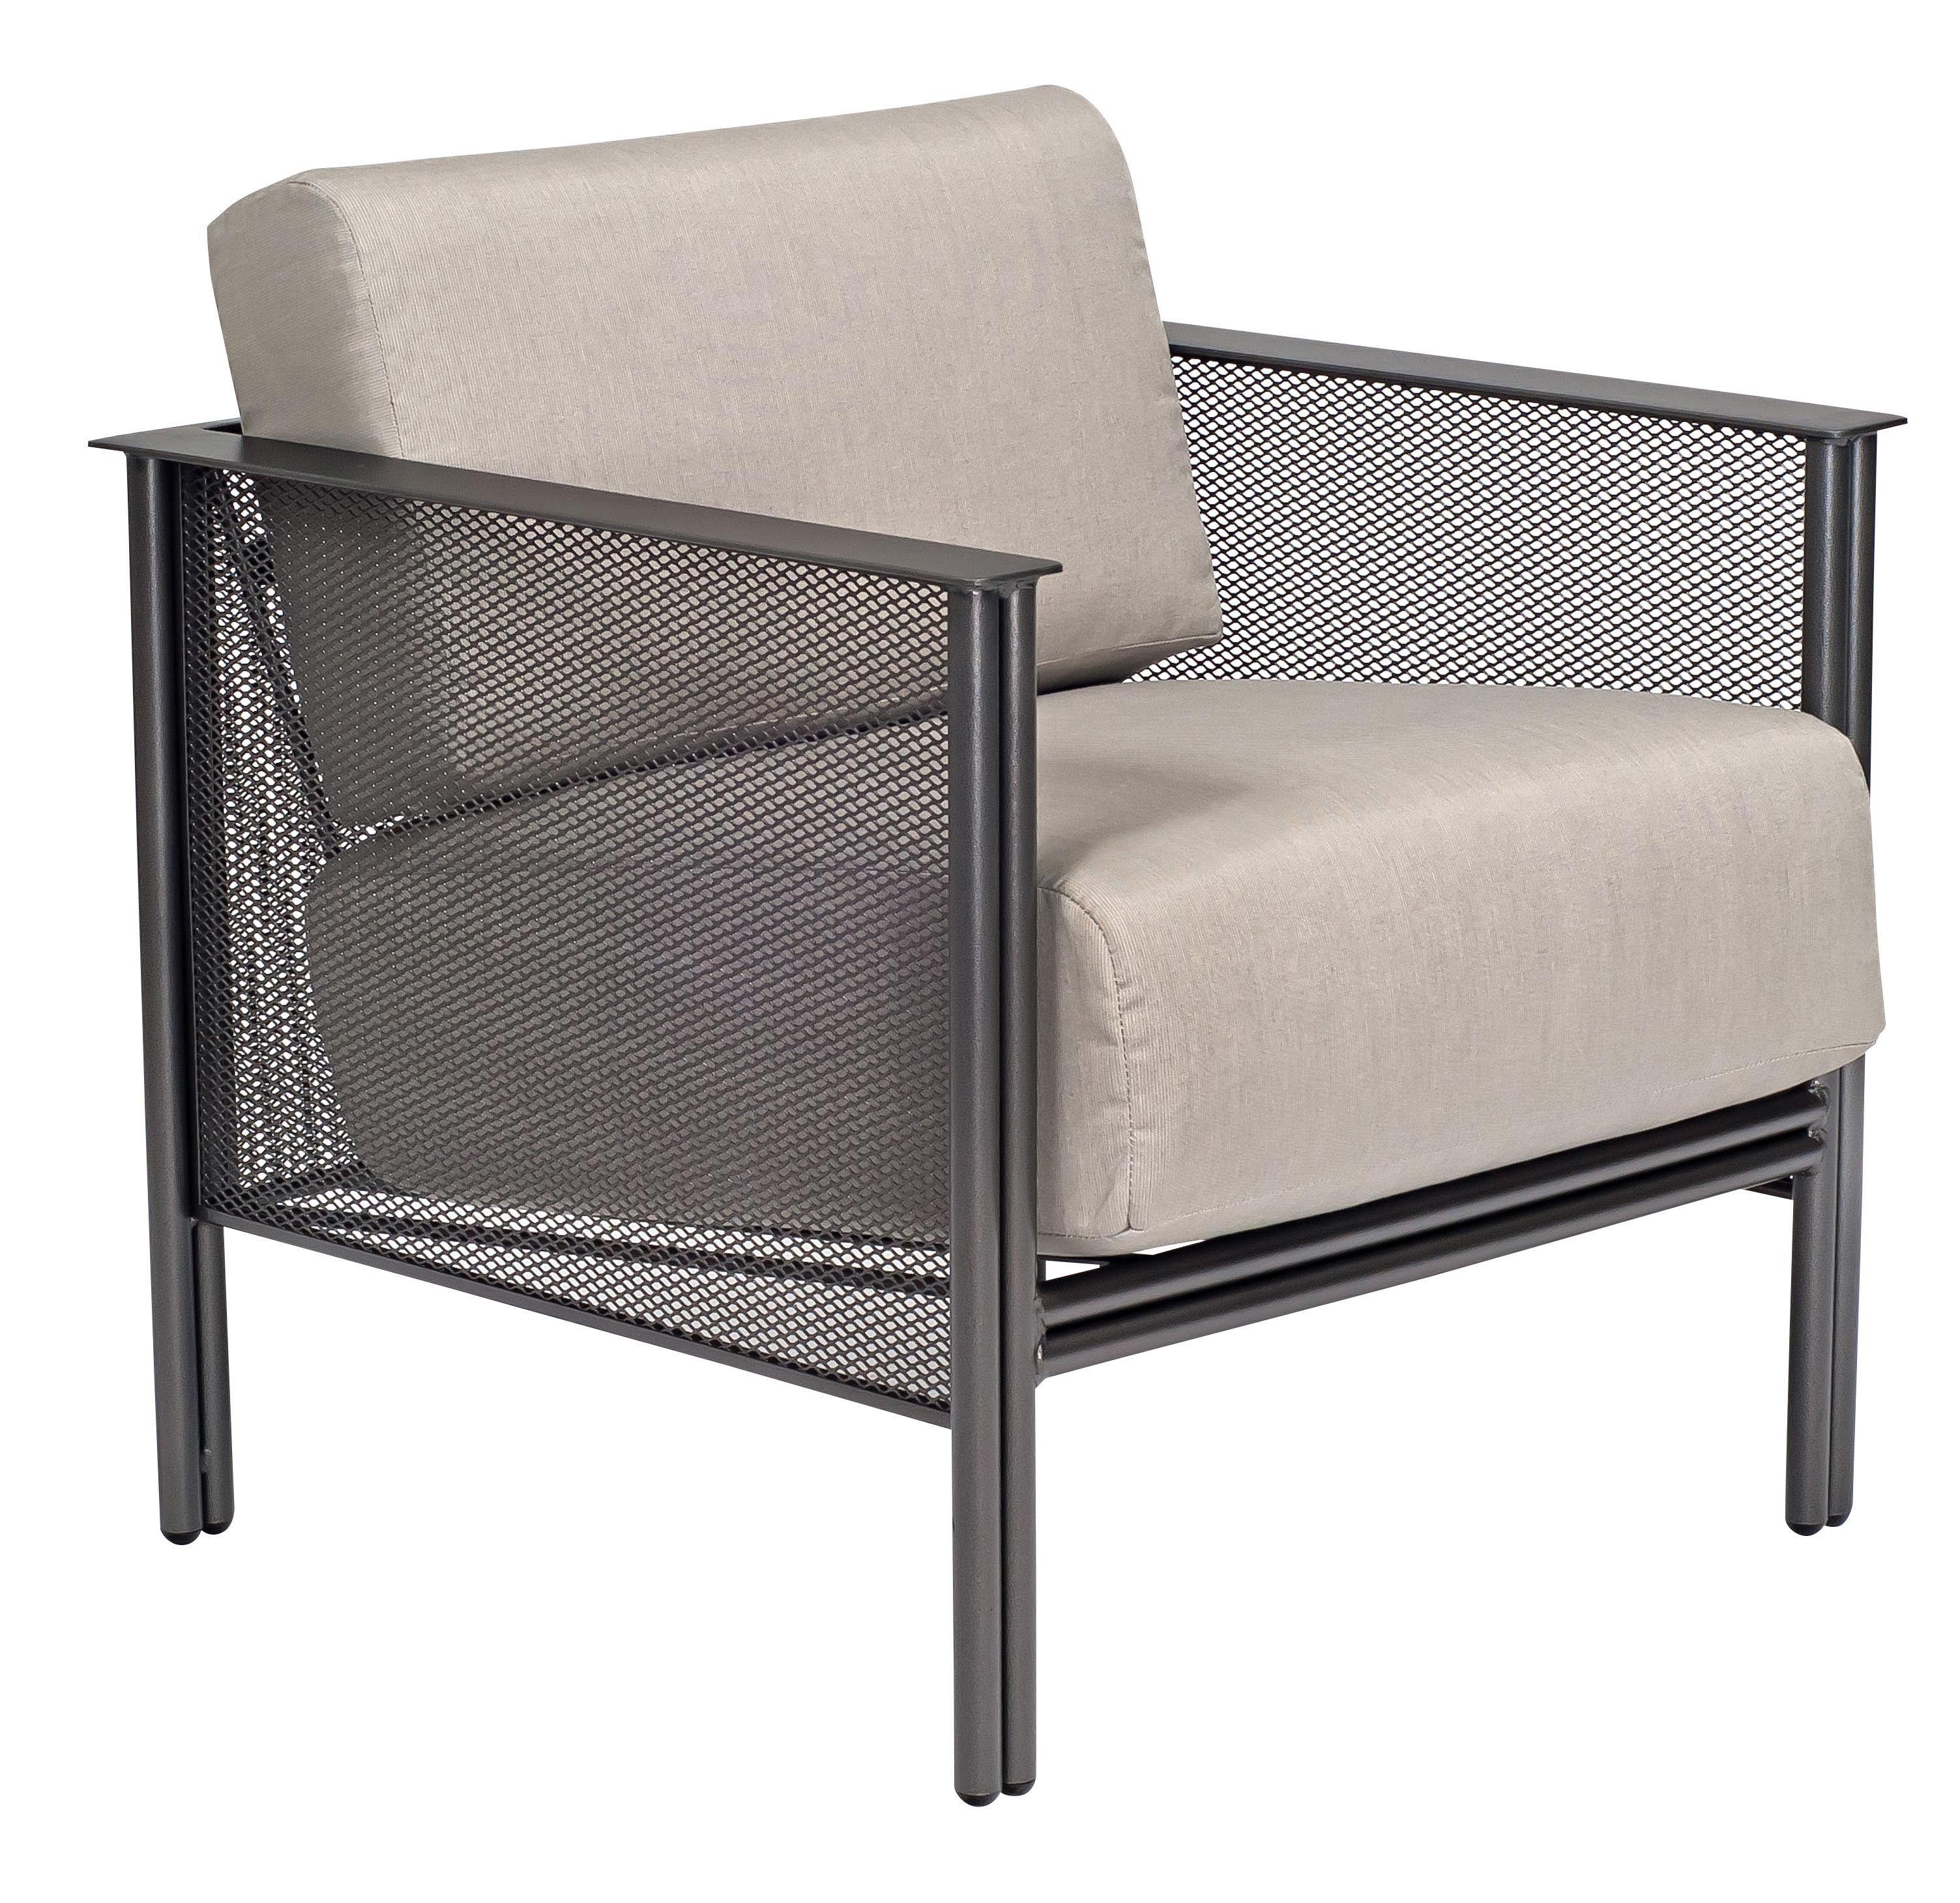 Jax Lounge Lounge chair outdoor, Patio lounge chairs